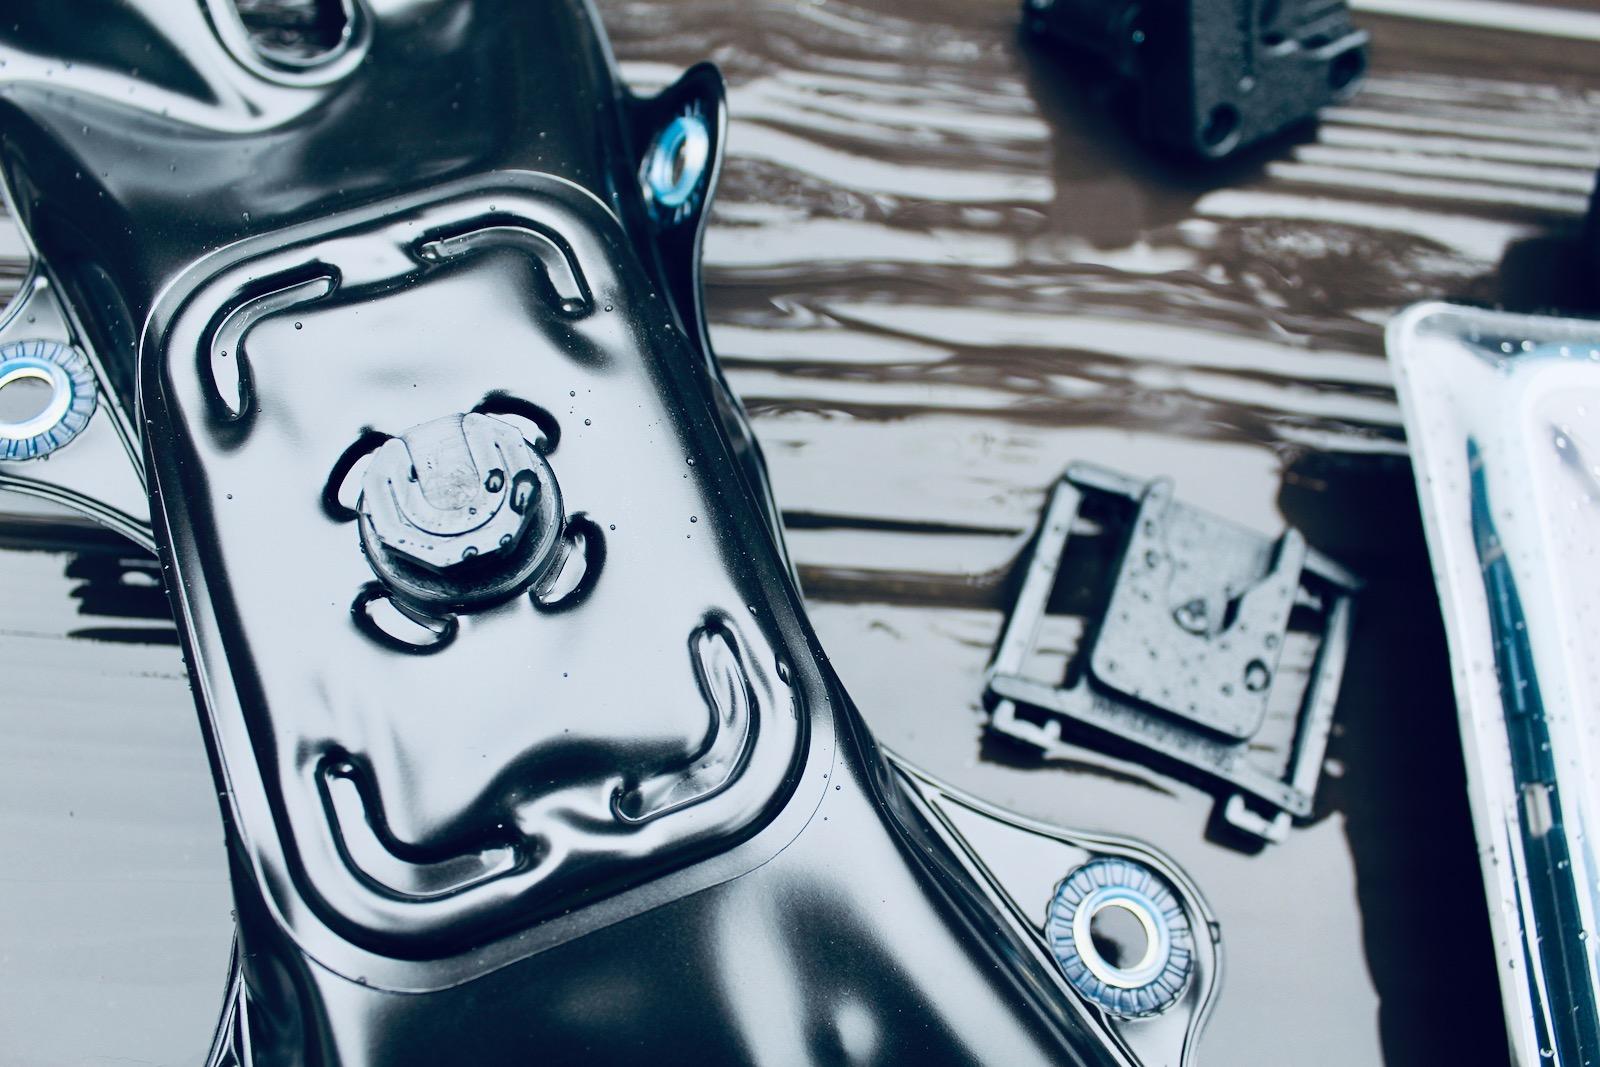 Aquapac Extreme Pro DockSystem Waterproof Phone VHF Cases